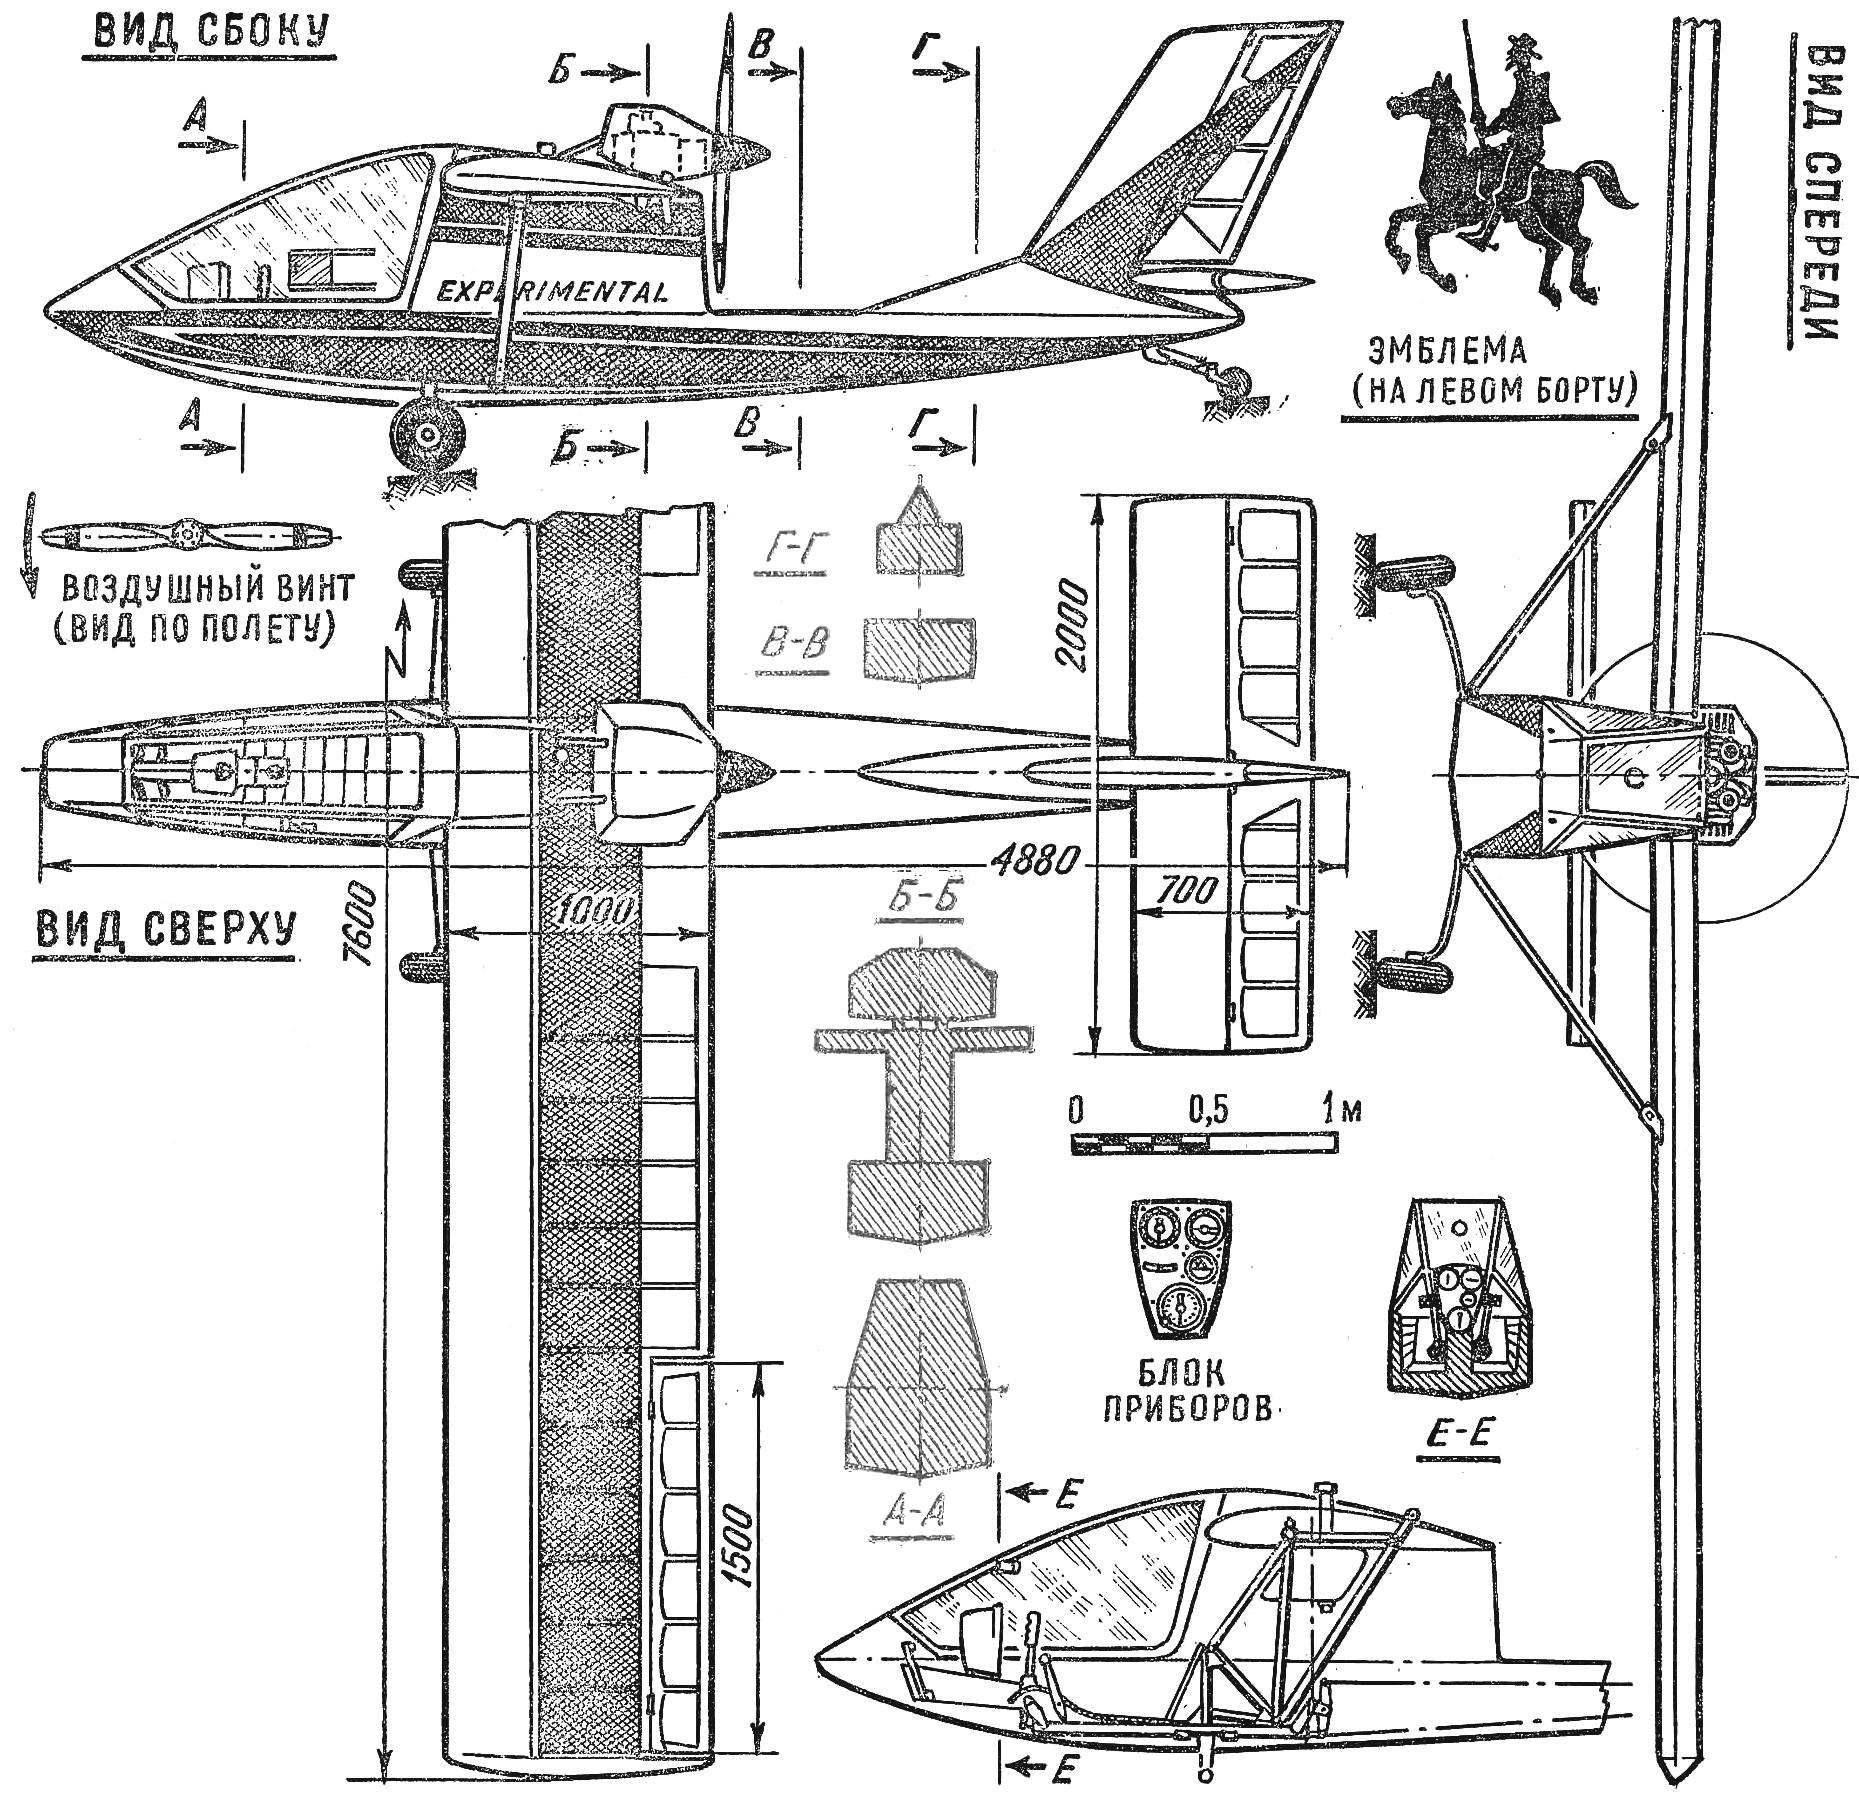 Рис. 5. Схема микросамолета «Дон-Кихот» в трех проекциях.